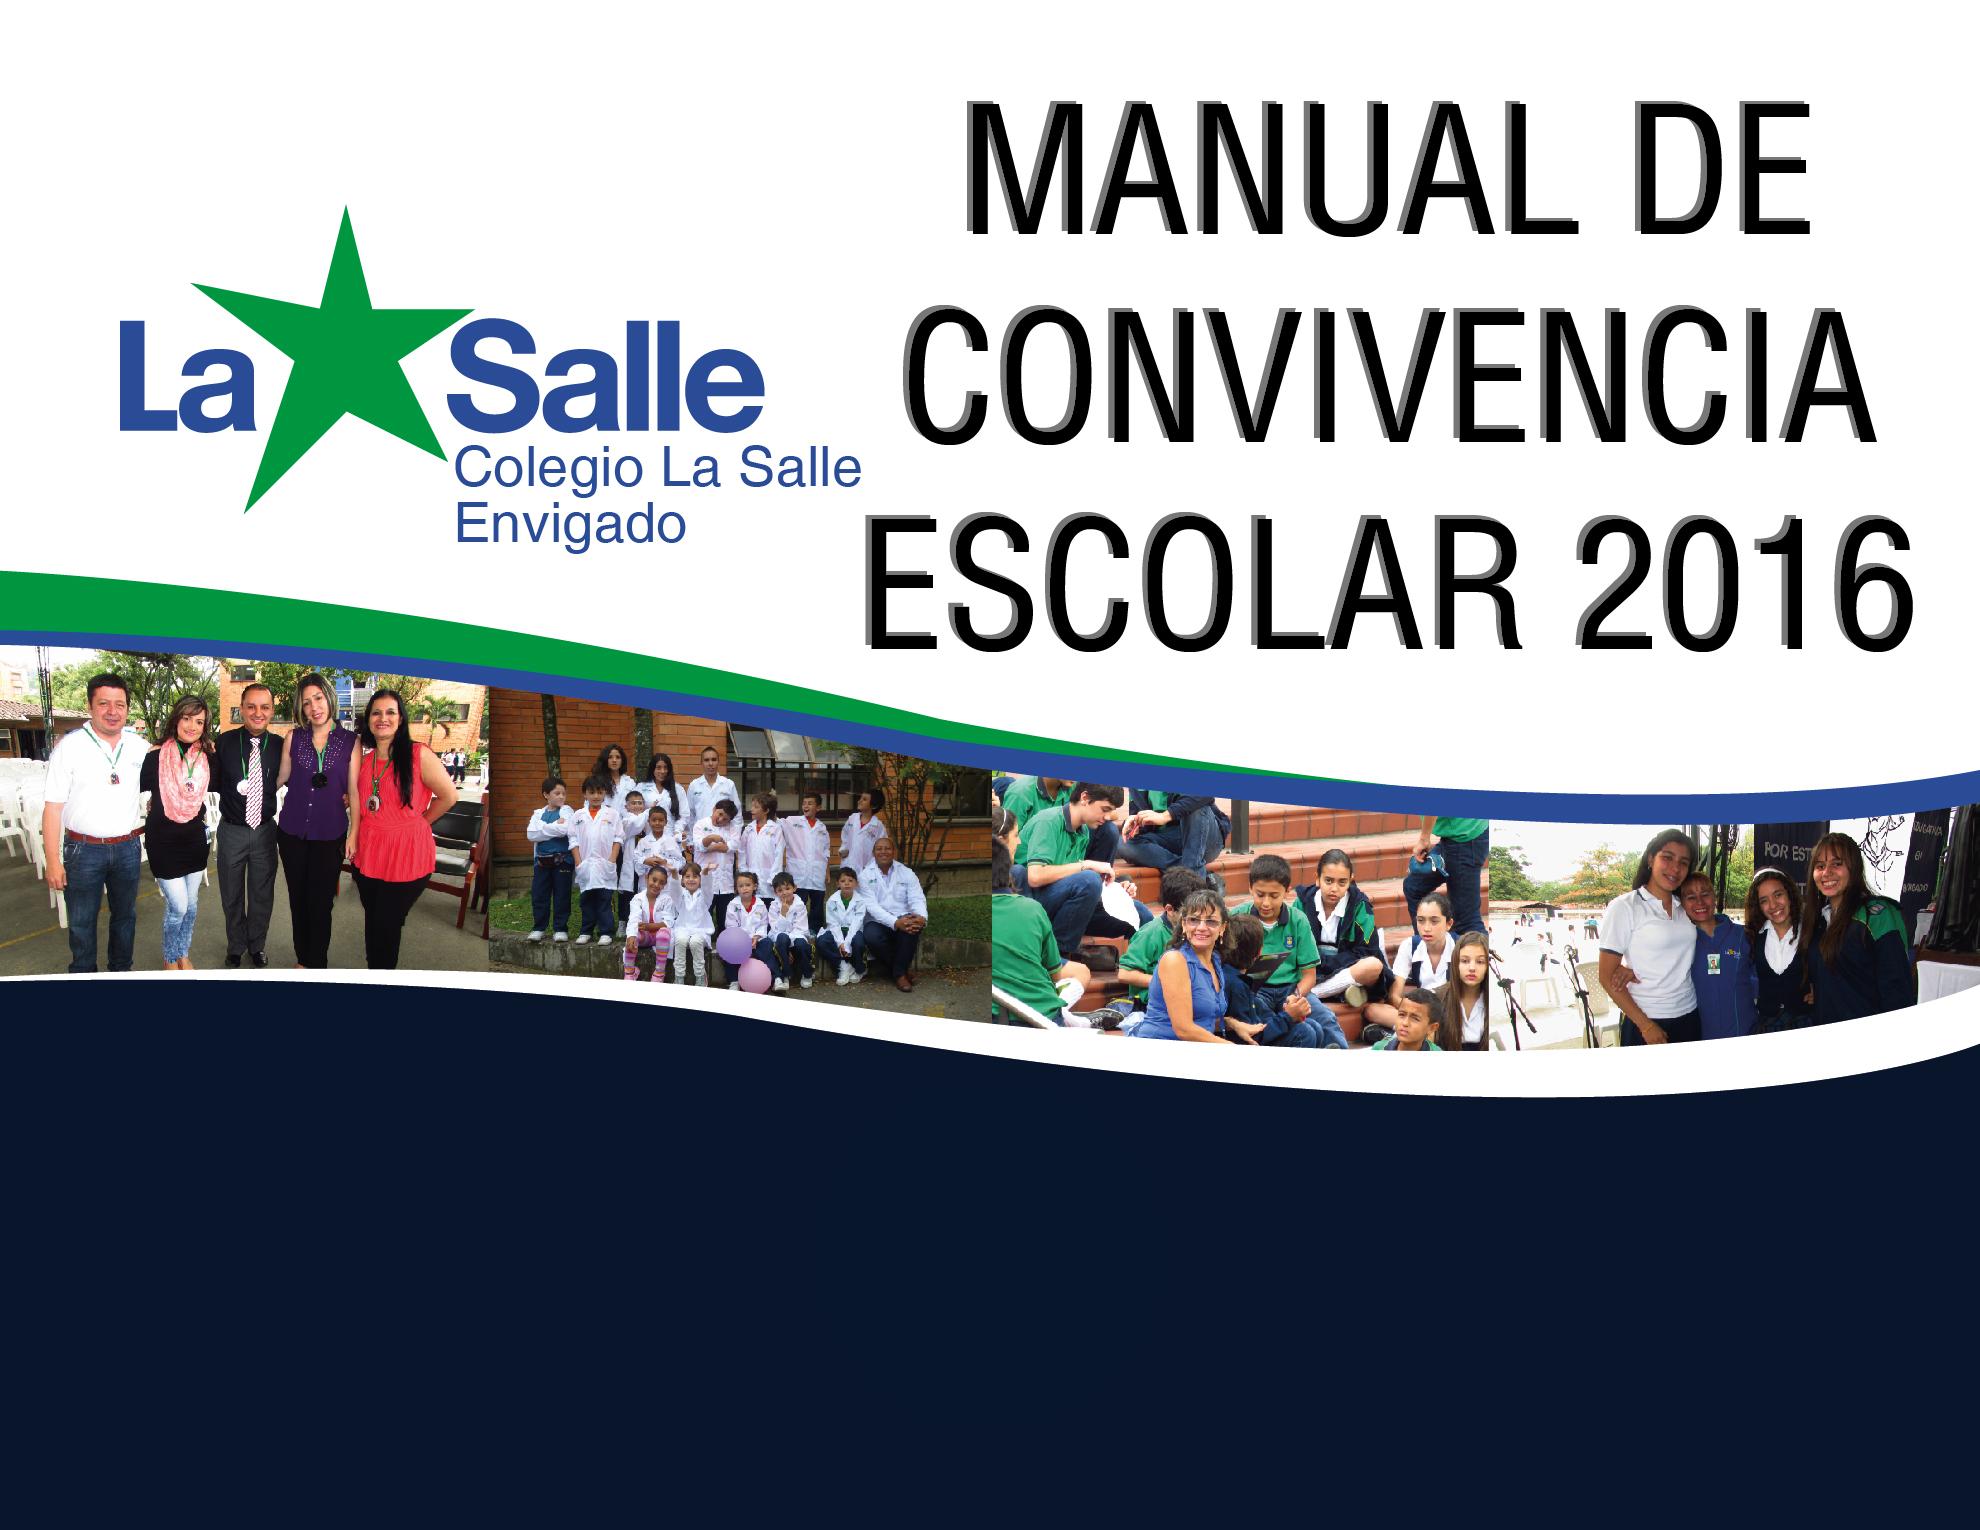 Concurso de docentes 2016 colombiaa for Concurso de docentes 2016